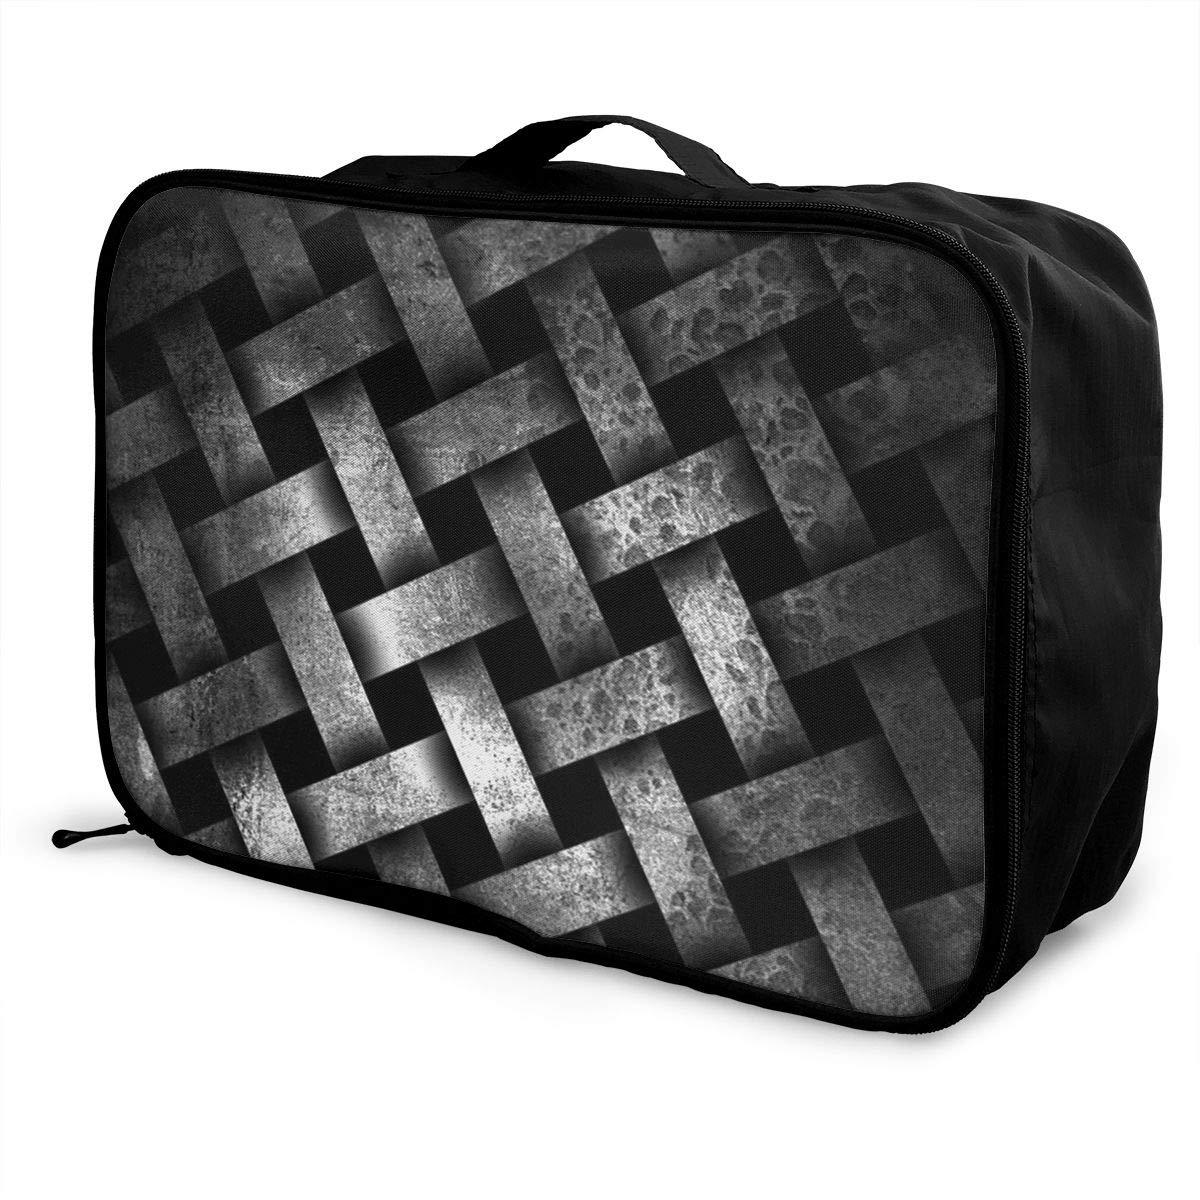 ADGAI Black Weave Pattern Canvas Travel Weekender Bag,Fashion Custom Lightweight Large Capacity Portable Luggage Bag,Suitcase Trolley Bag